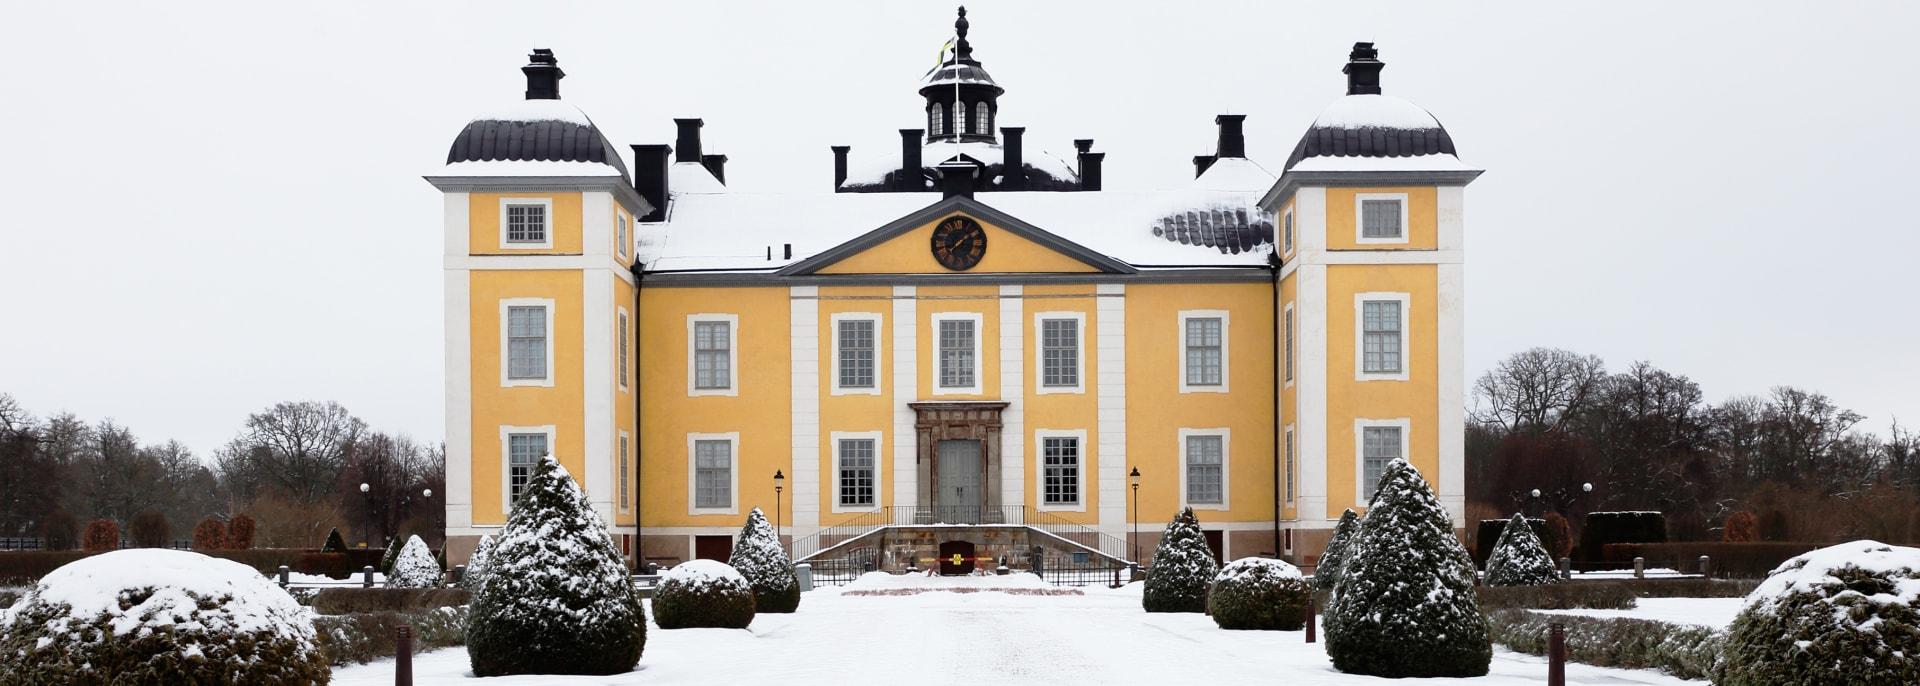 Färna, Schweden